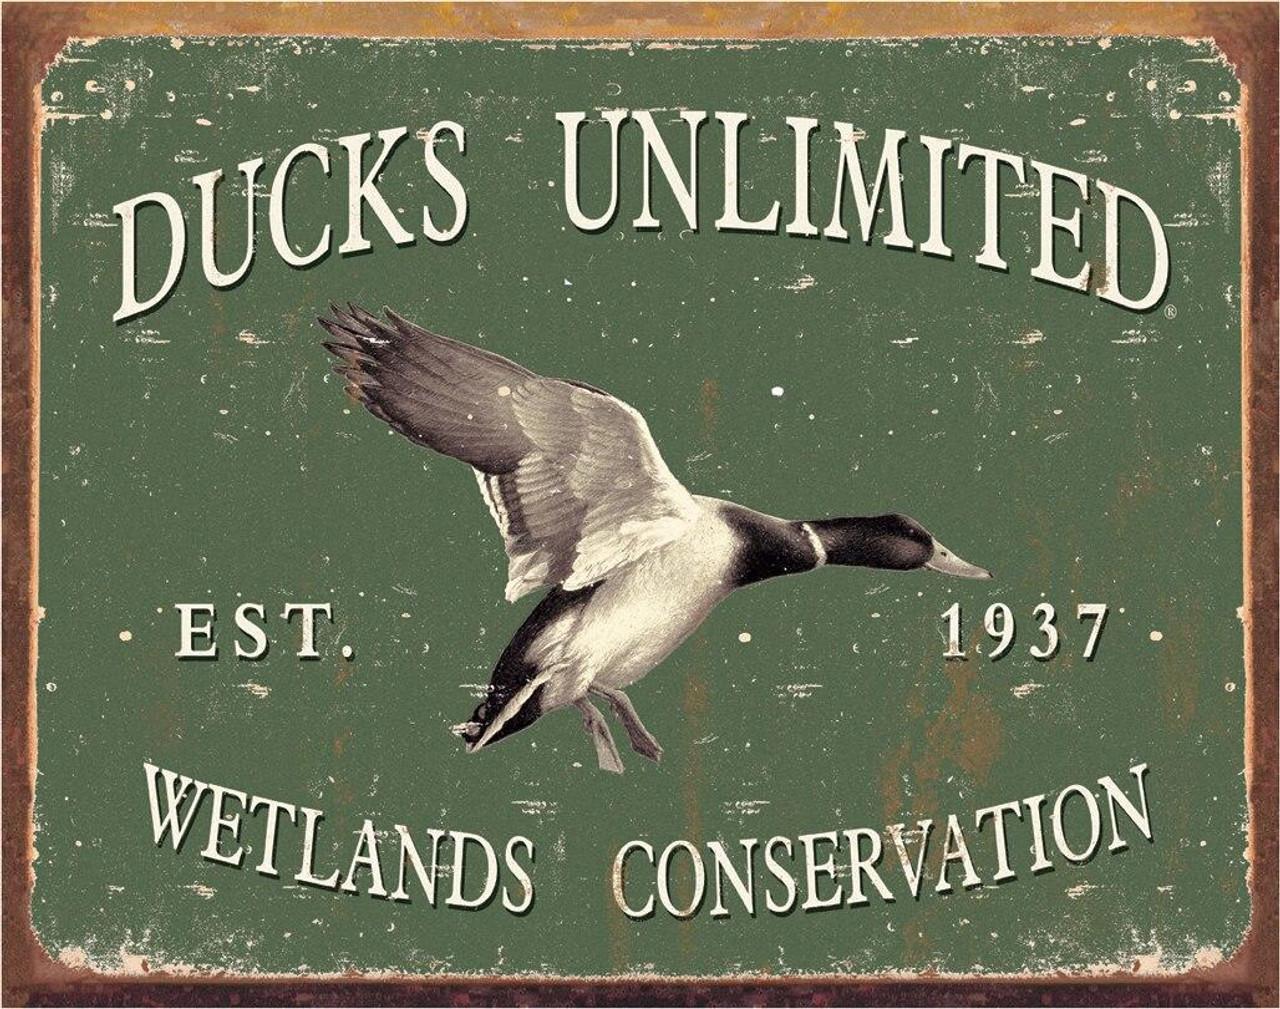 Ducks Unlimited - Since 1937